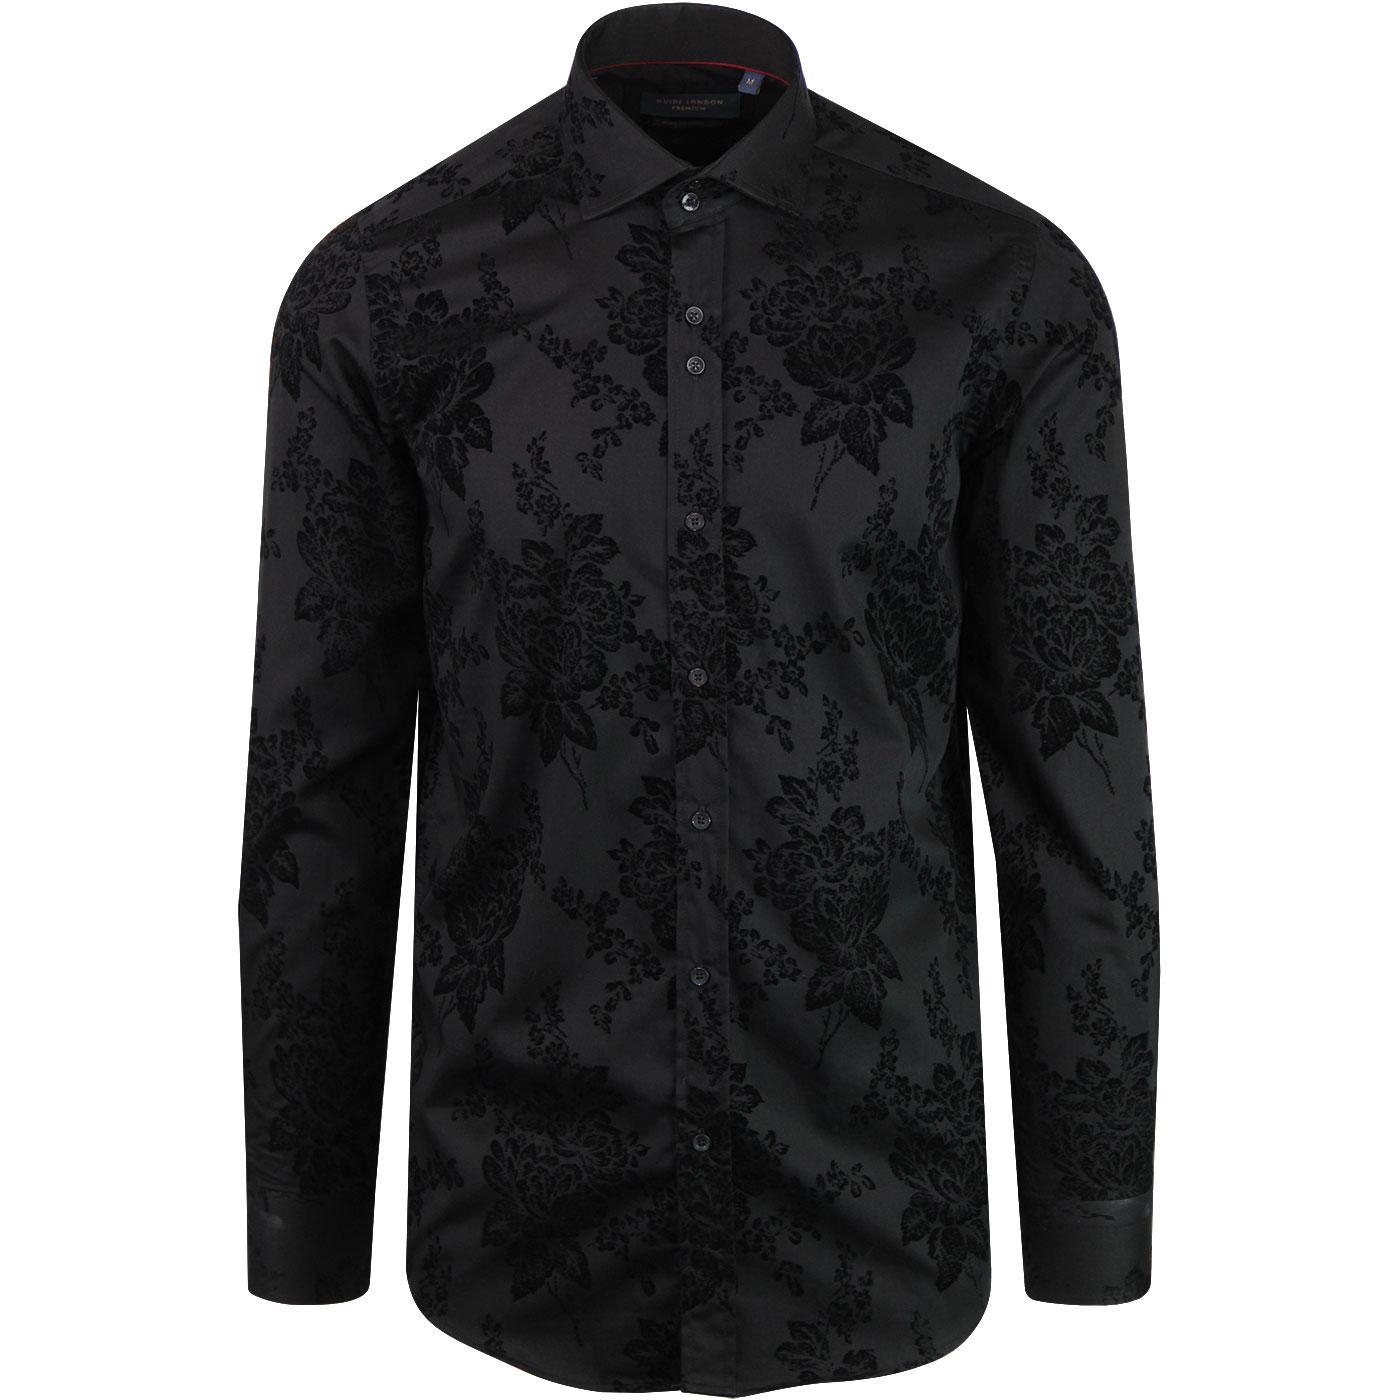 GUIDE LONDON 60s Mod Baroque Floral Shirt (Black)